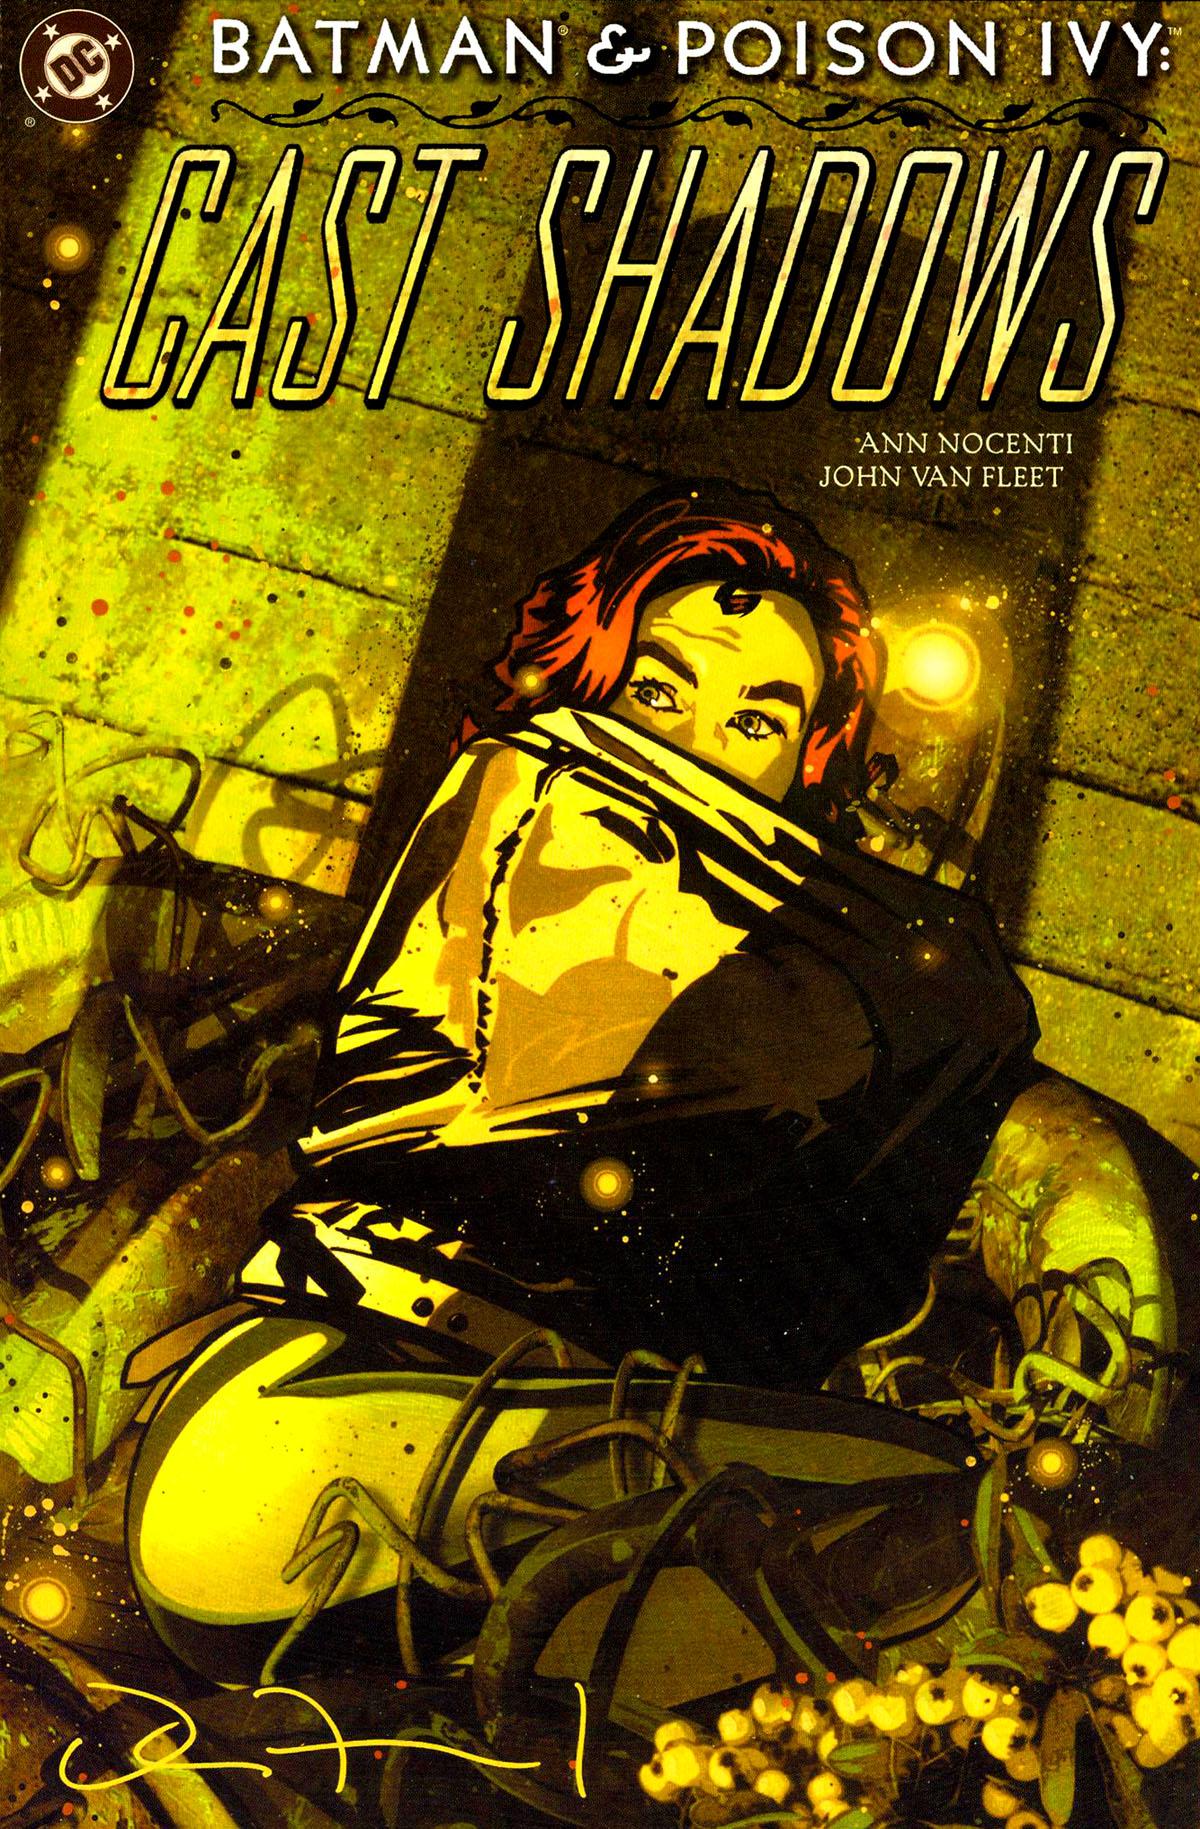 Batman/Poison Ivy: Cast Shadows Full Page 1